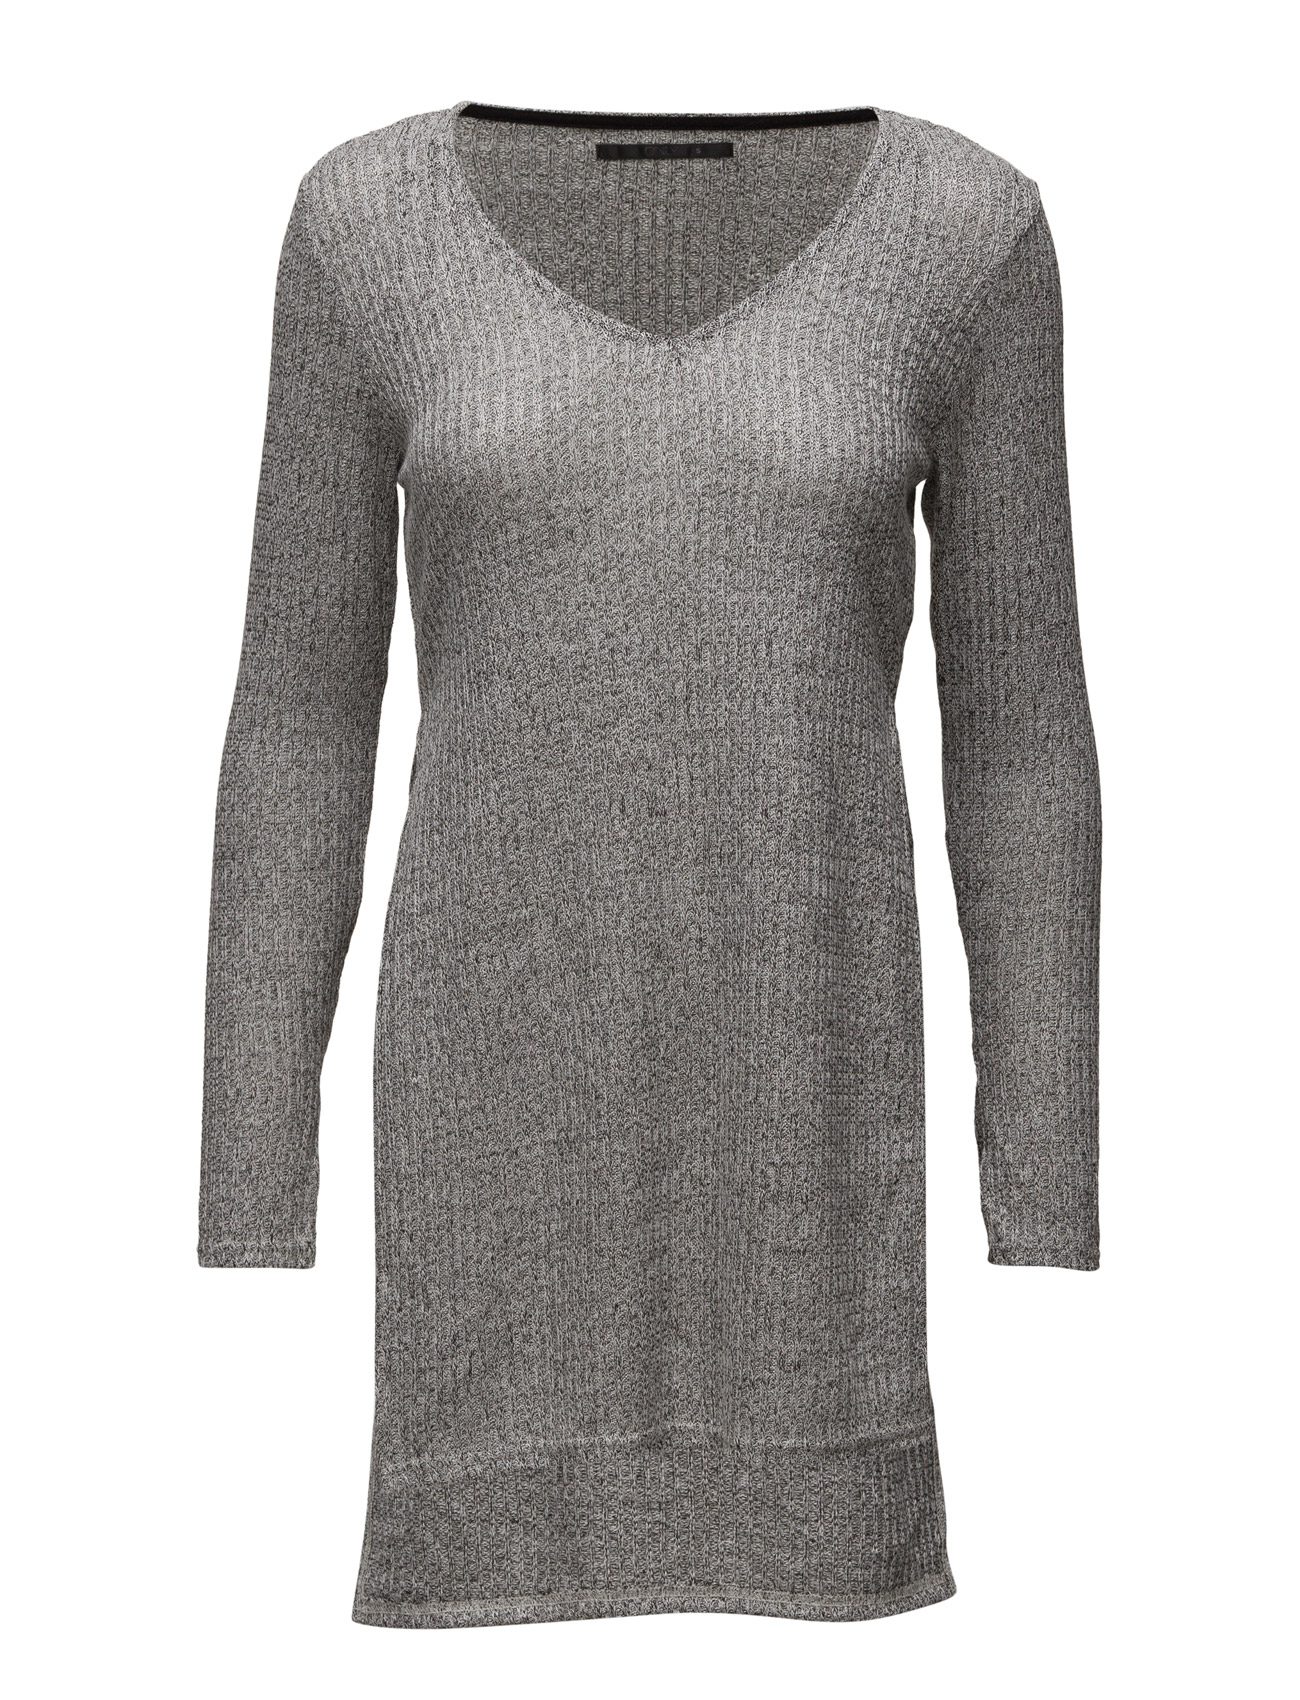 Onldhaka L/S Long Slit Pullover Knt ONLY Kjoler til Kvinder i Medium Grey Melange